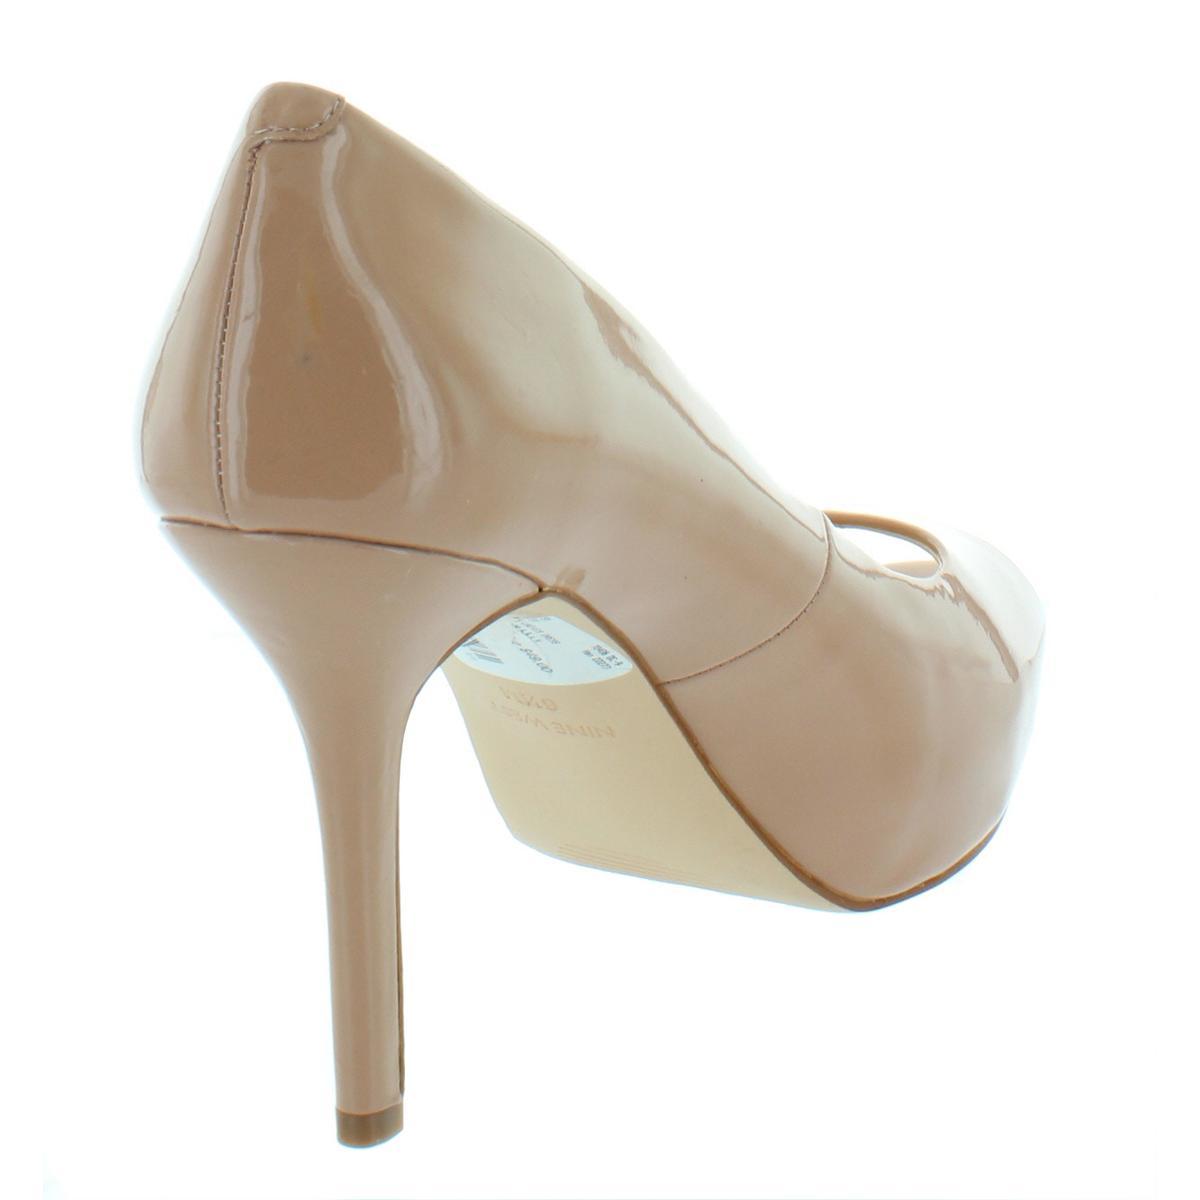 83a34a162788 Nine West Womens Qtpie Beige Patent Peep Toe Pumps 6.5 Medium (B